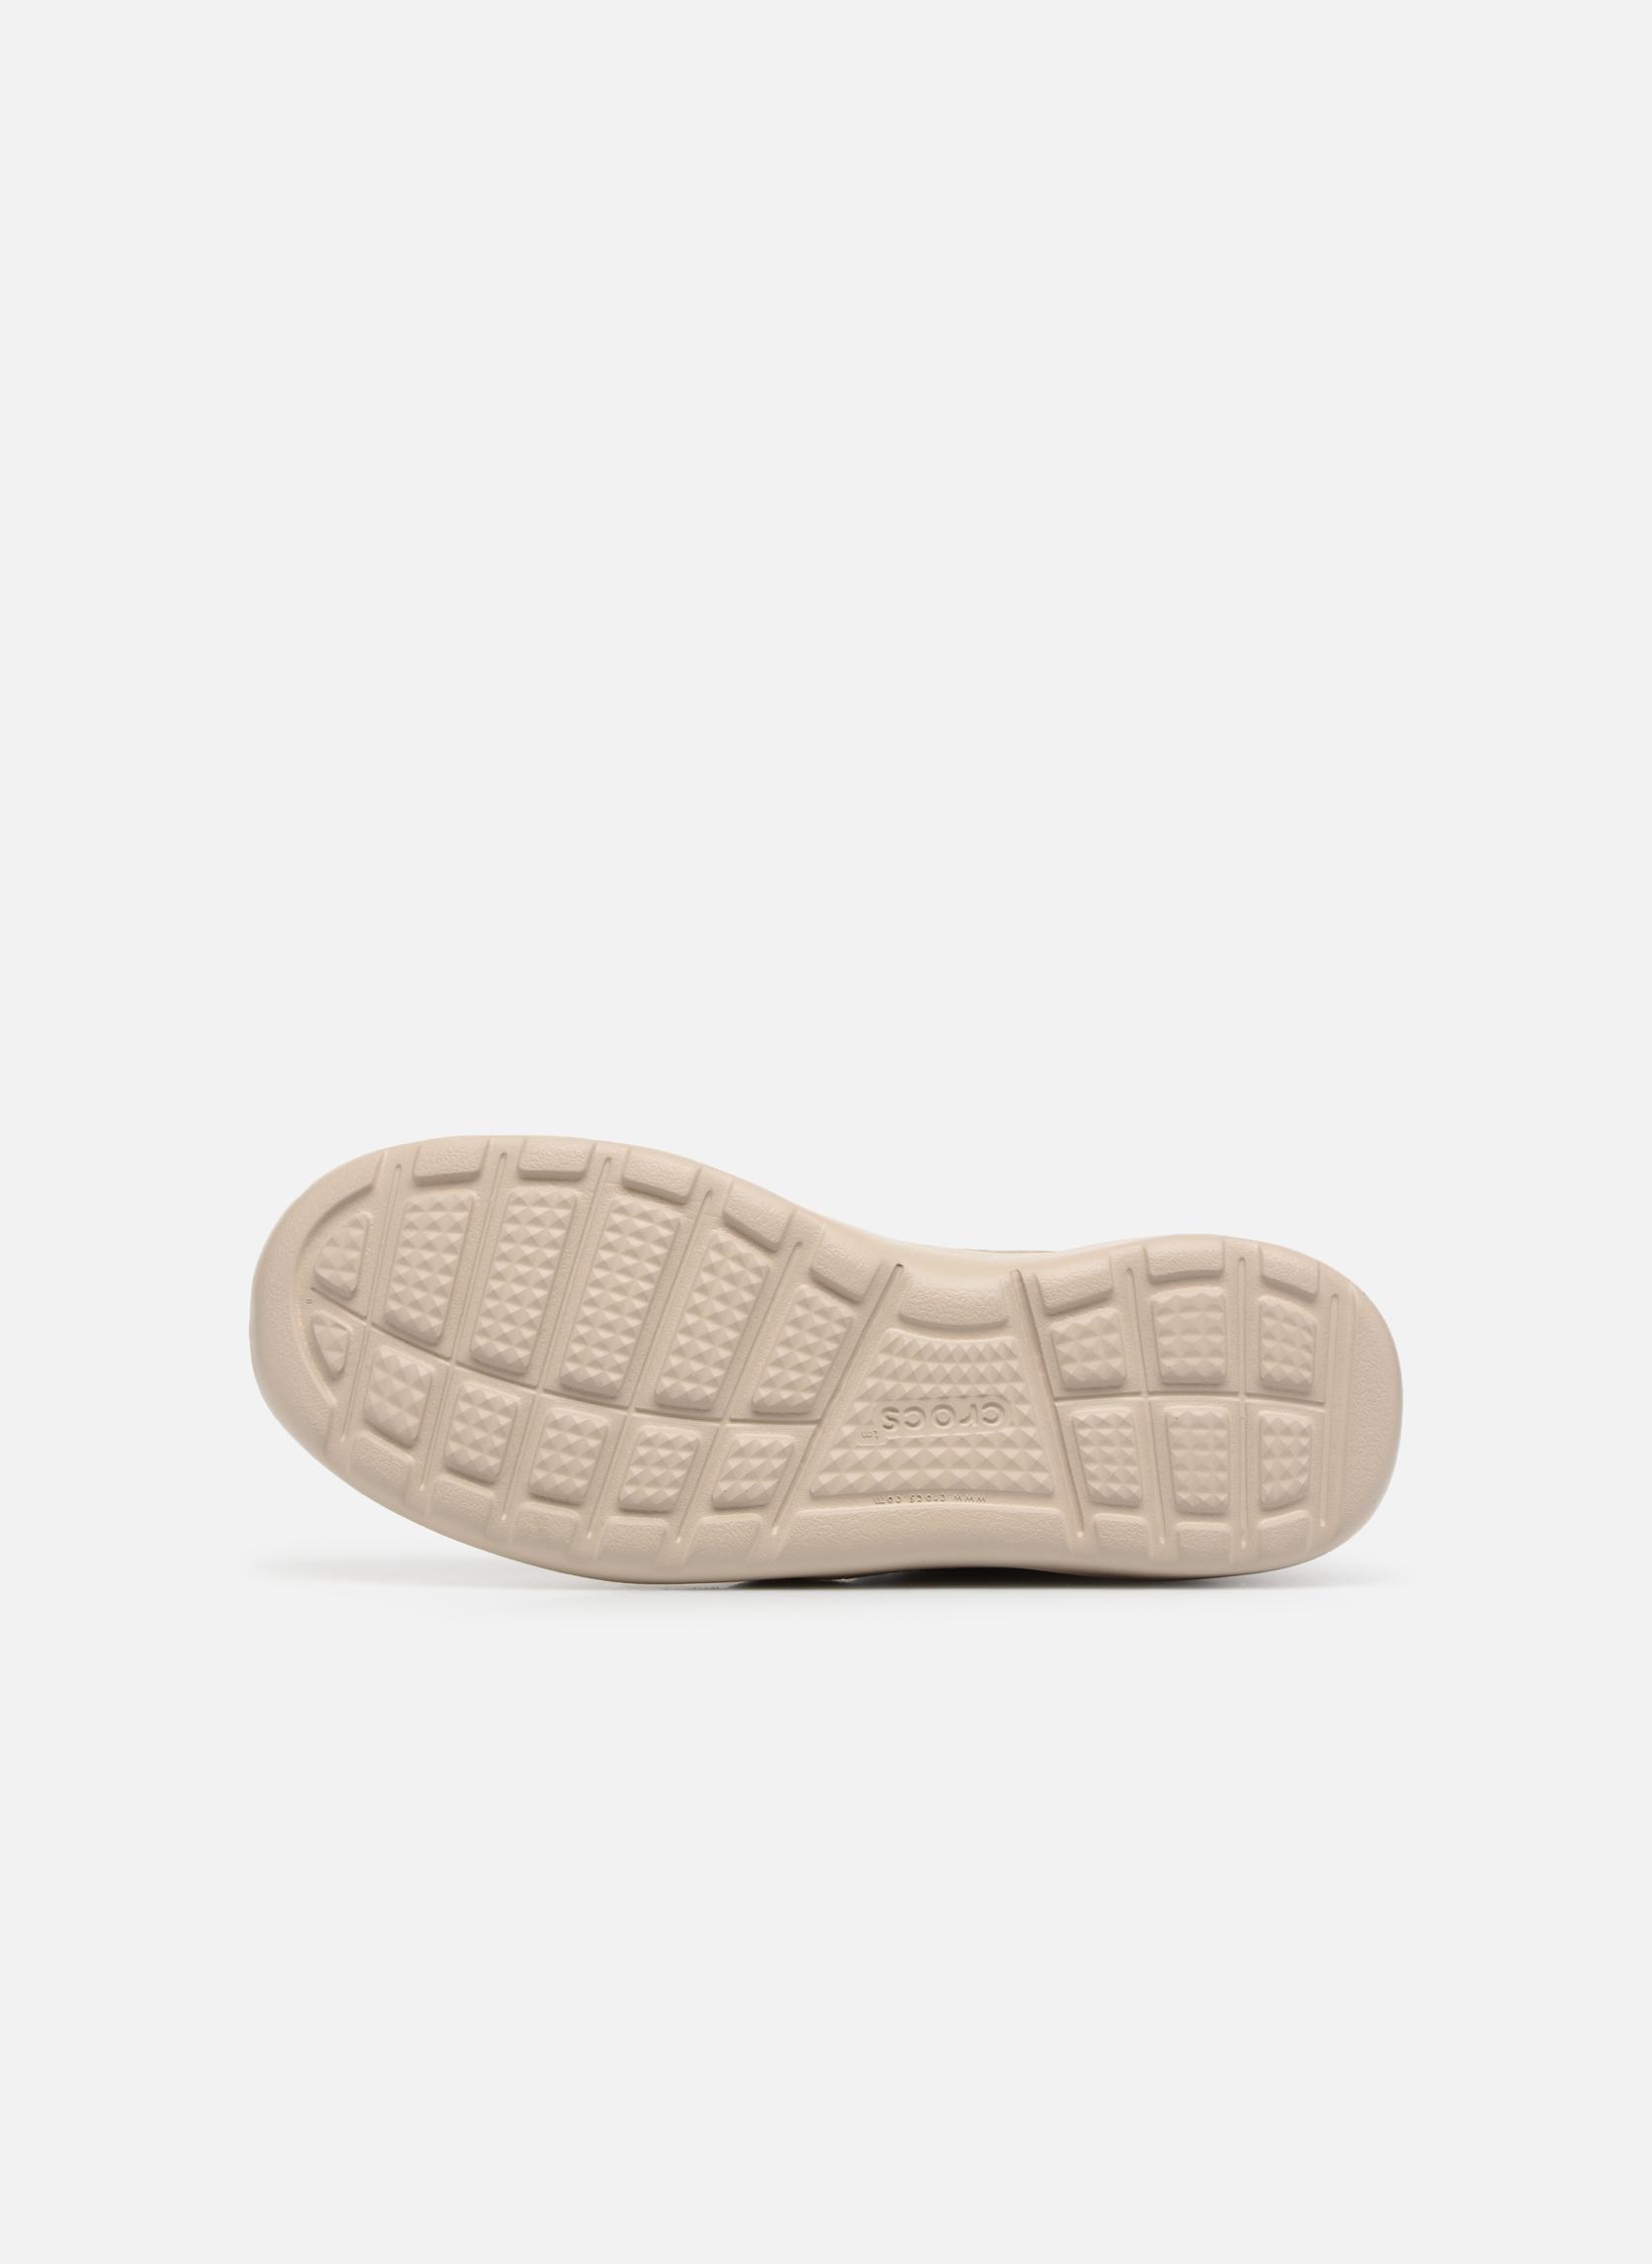 Crocs Kinsale Chukka M Mushroom/Cobblestone